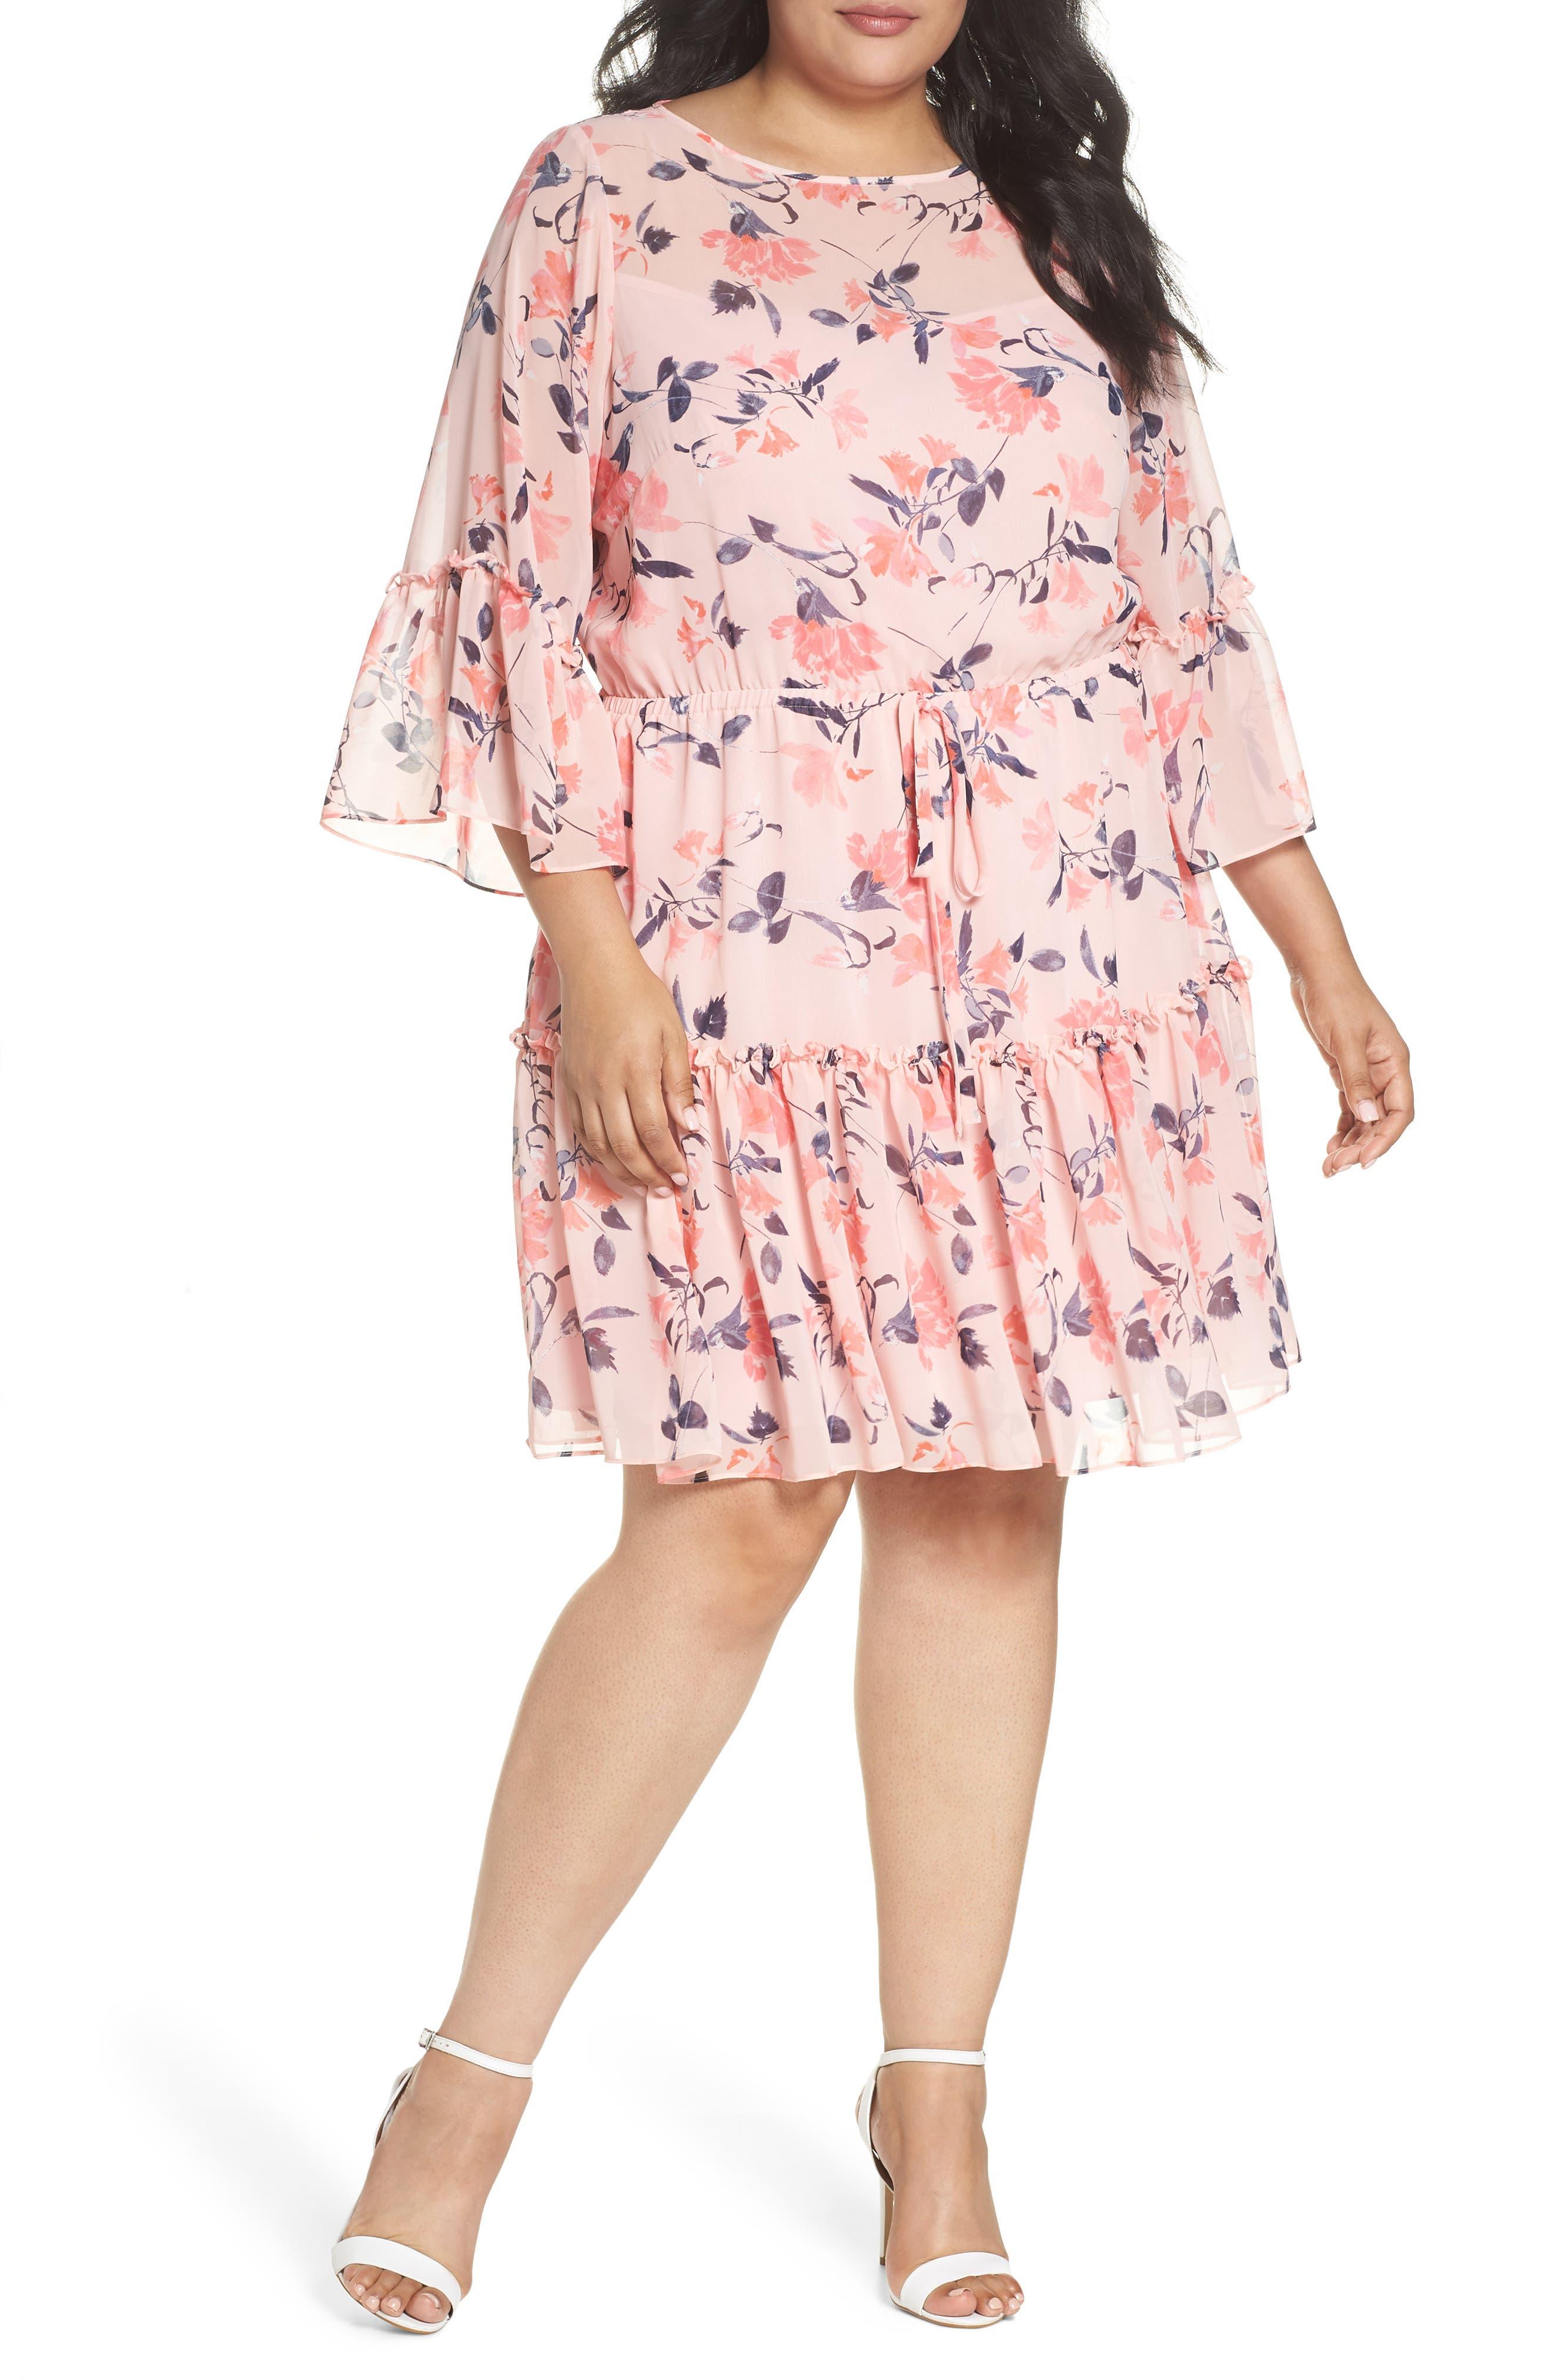 Elza J Floral Bell Sleeve Chiffon Dress,                         Main,                         color, Blush